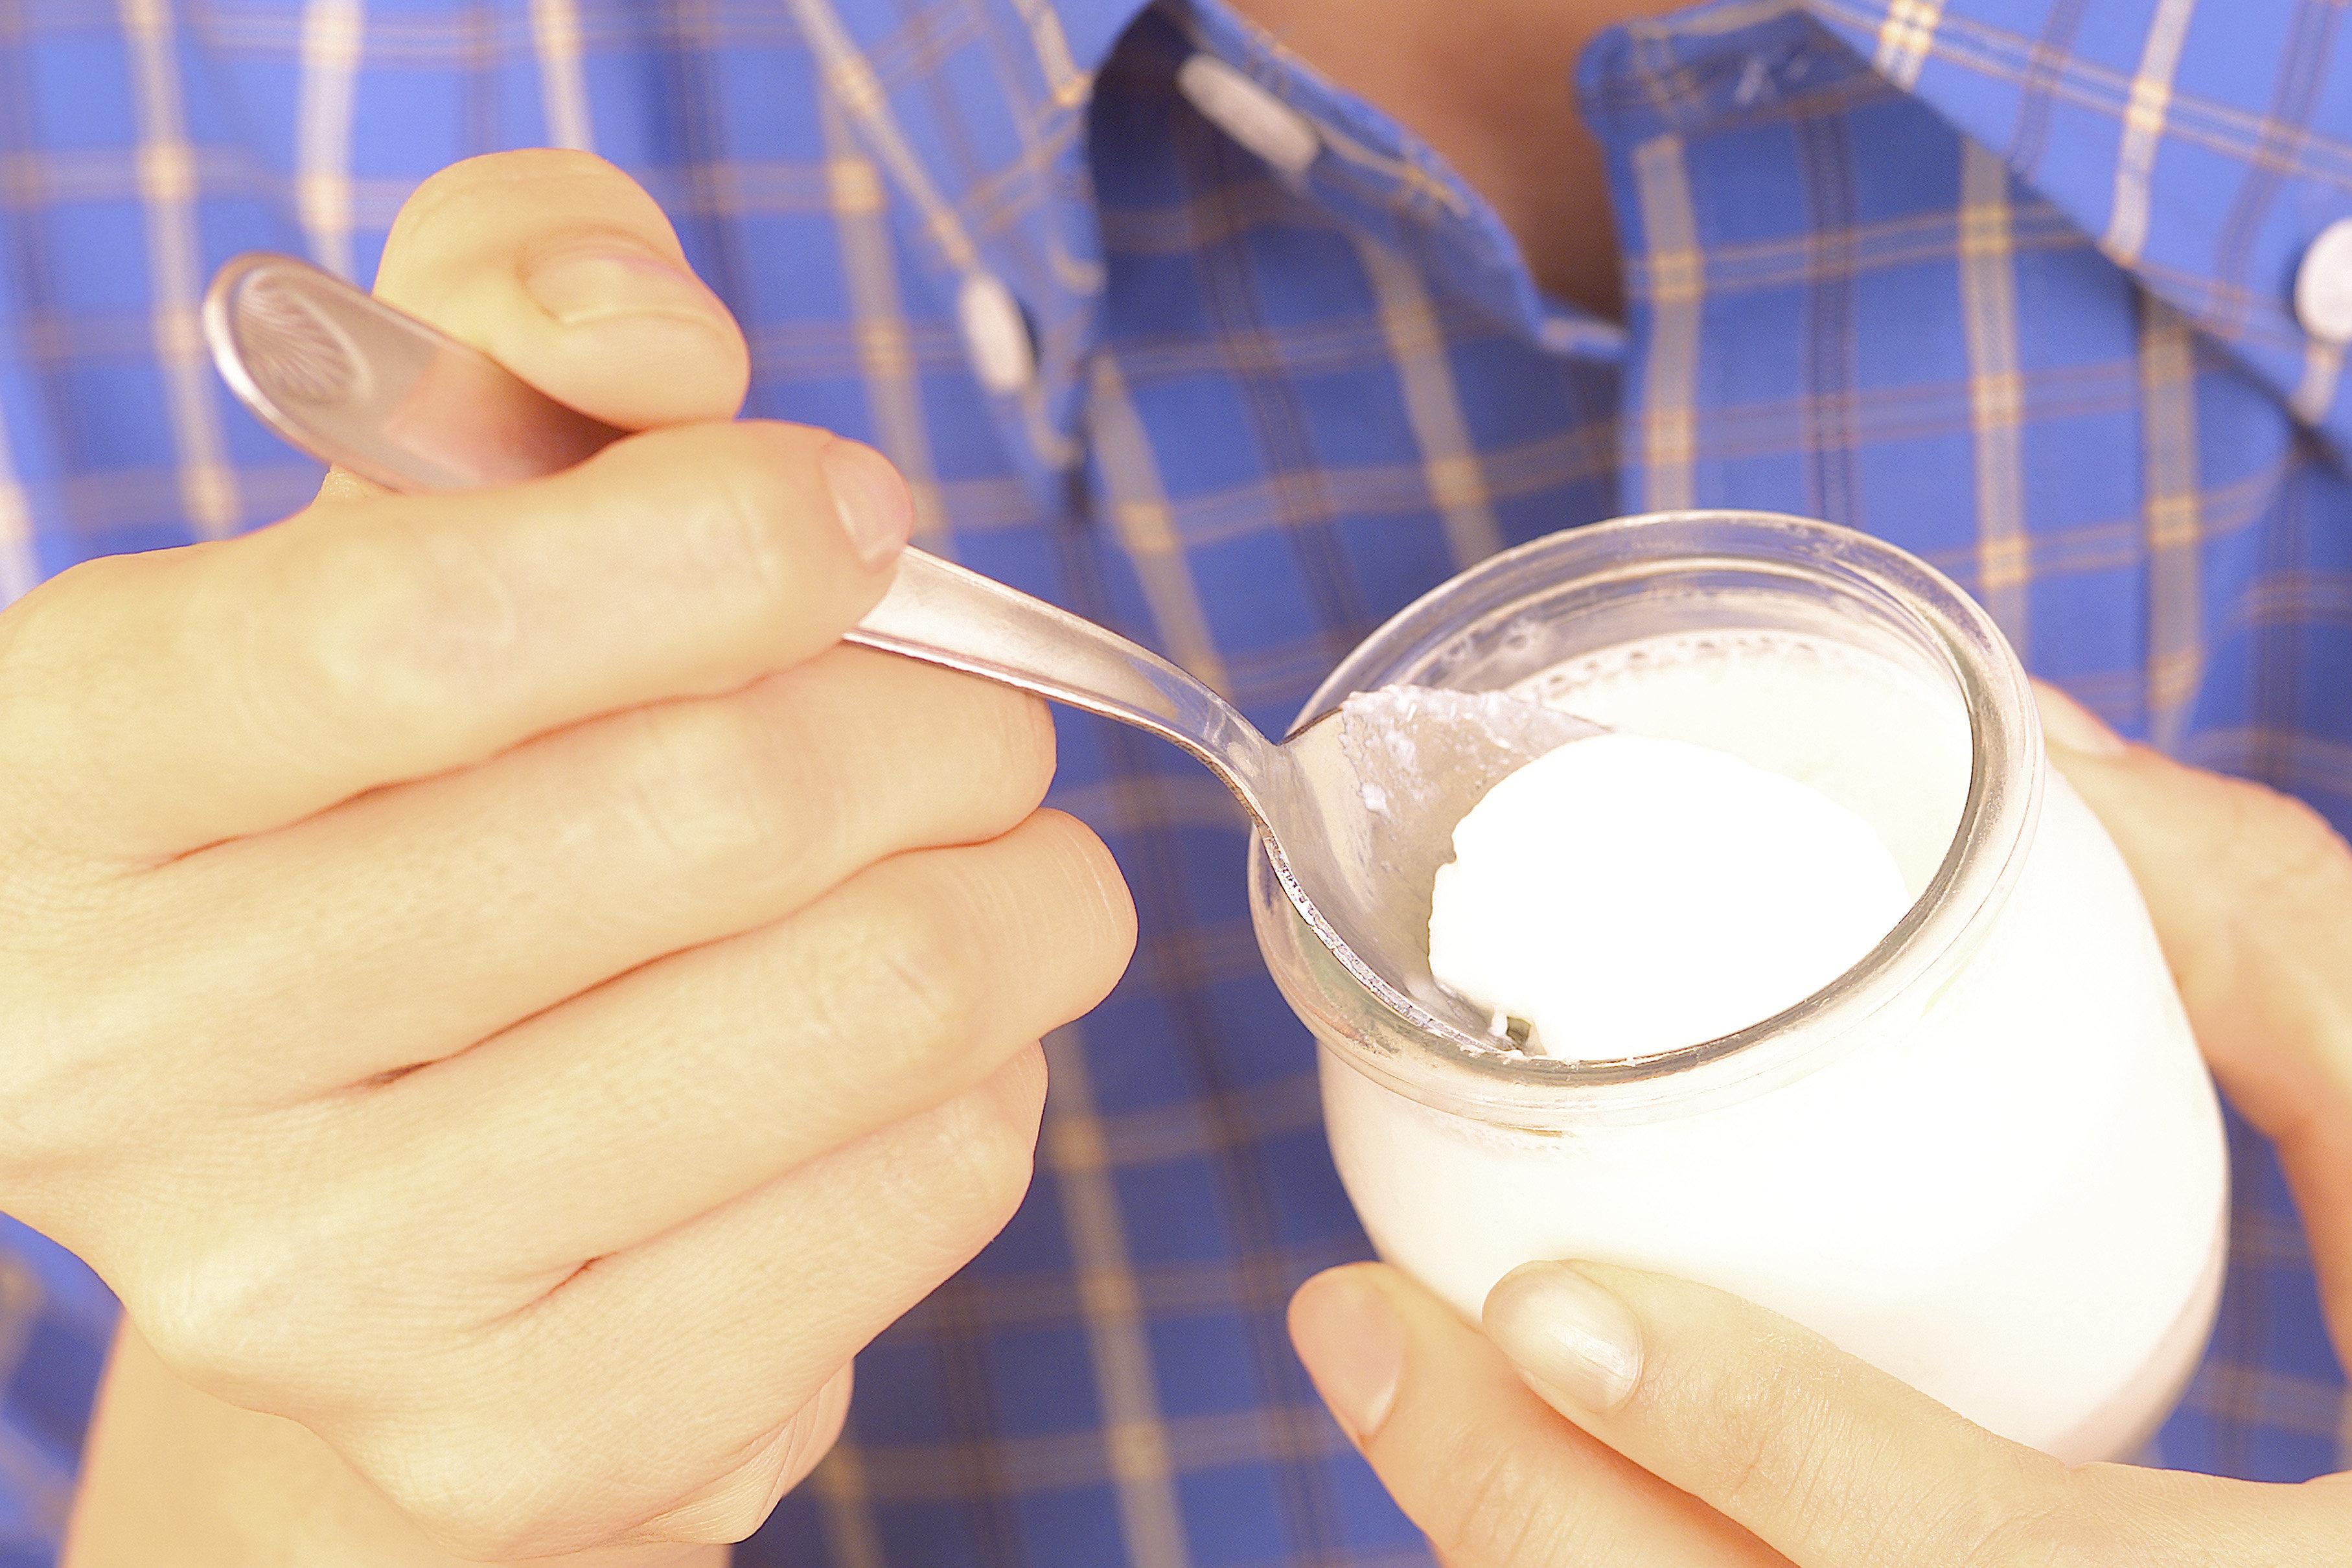 Vanilla yogurt may make us happier, according to a new study.